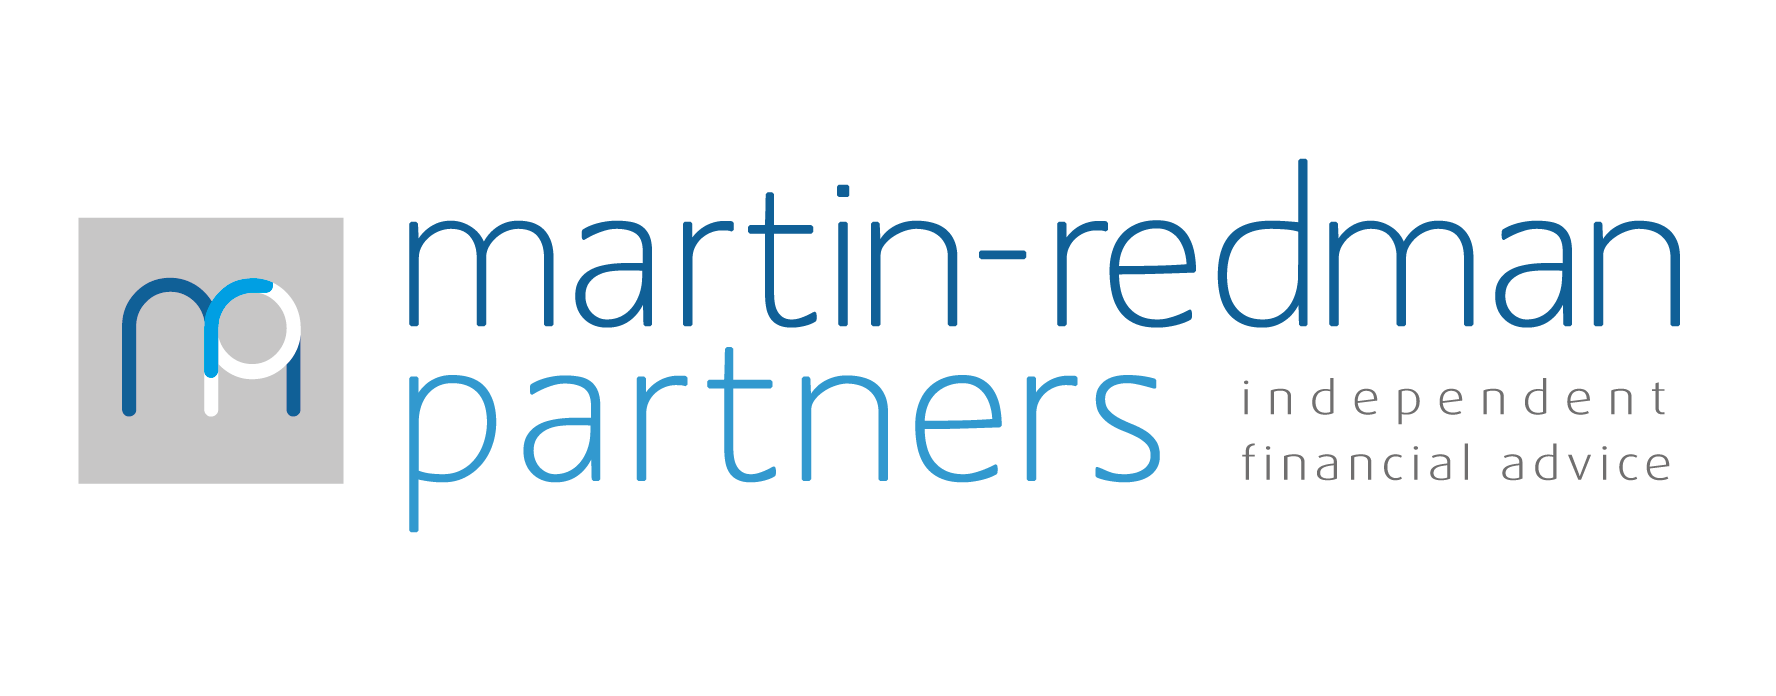 Martin-Redman Partners